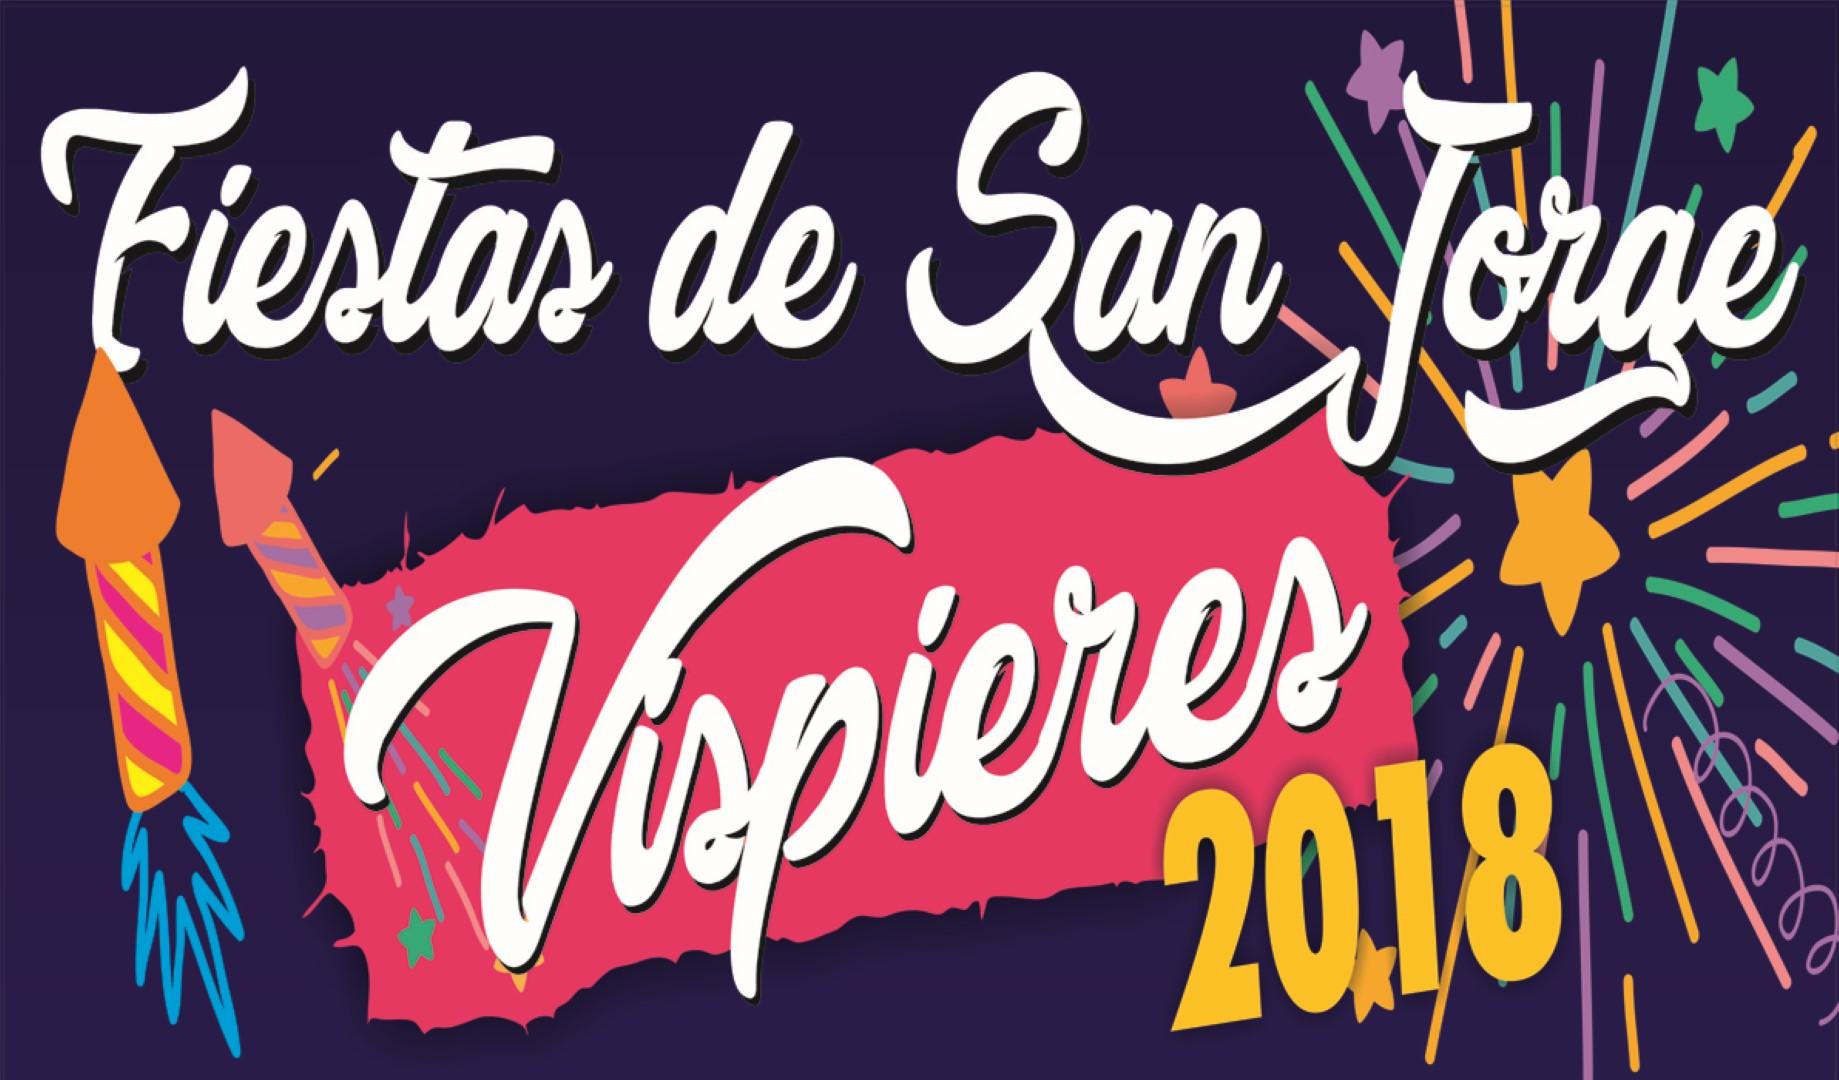 Fiestas de San Jorge en Vispieres_2018